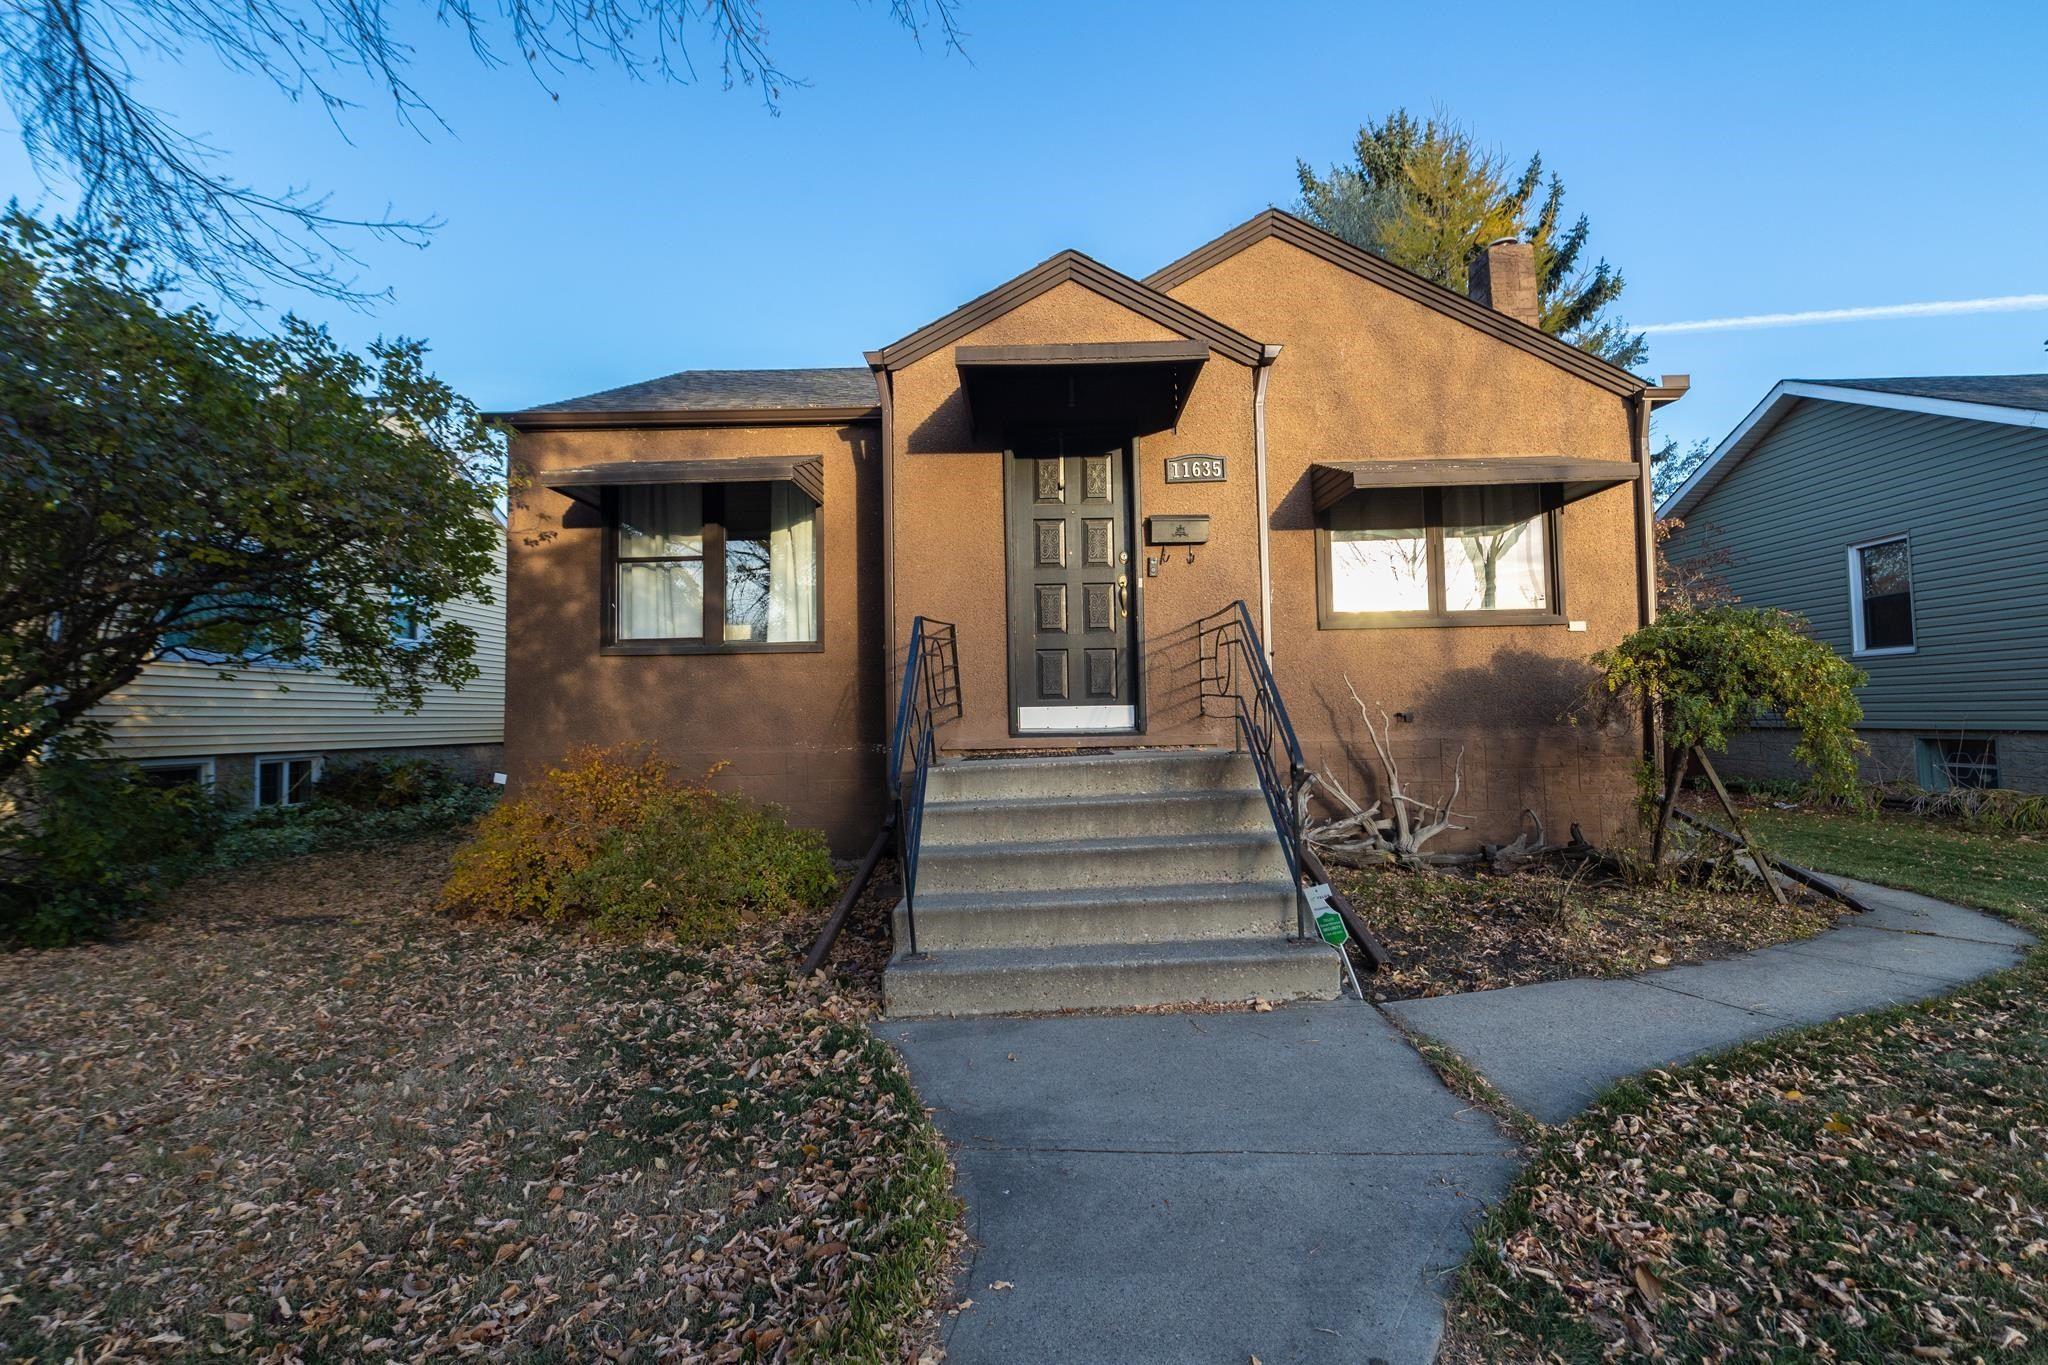 Main Photo: 11635 127 Street in Edmonton: Zone 07 House for sale : MLS®# E4266448